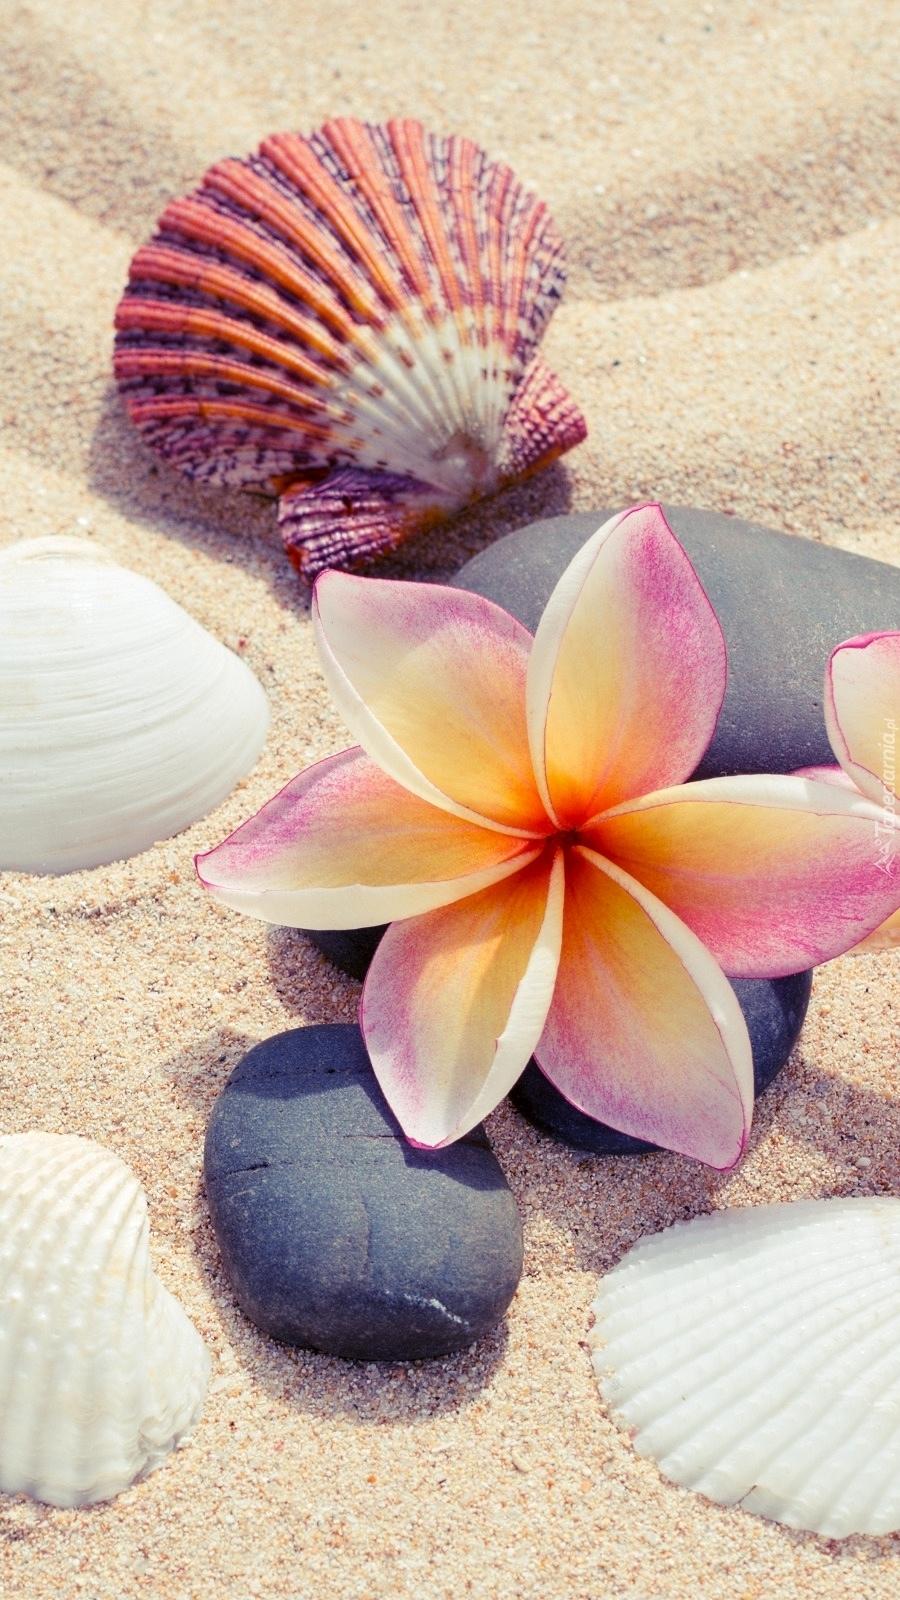 Plumeria i muszelki na piasku